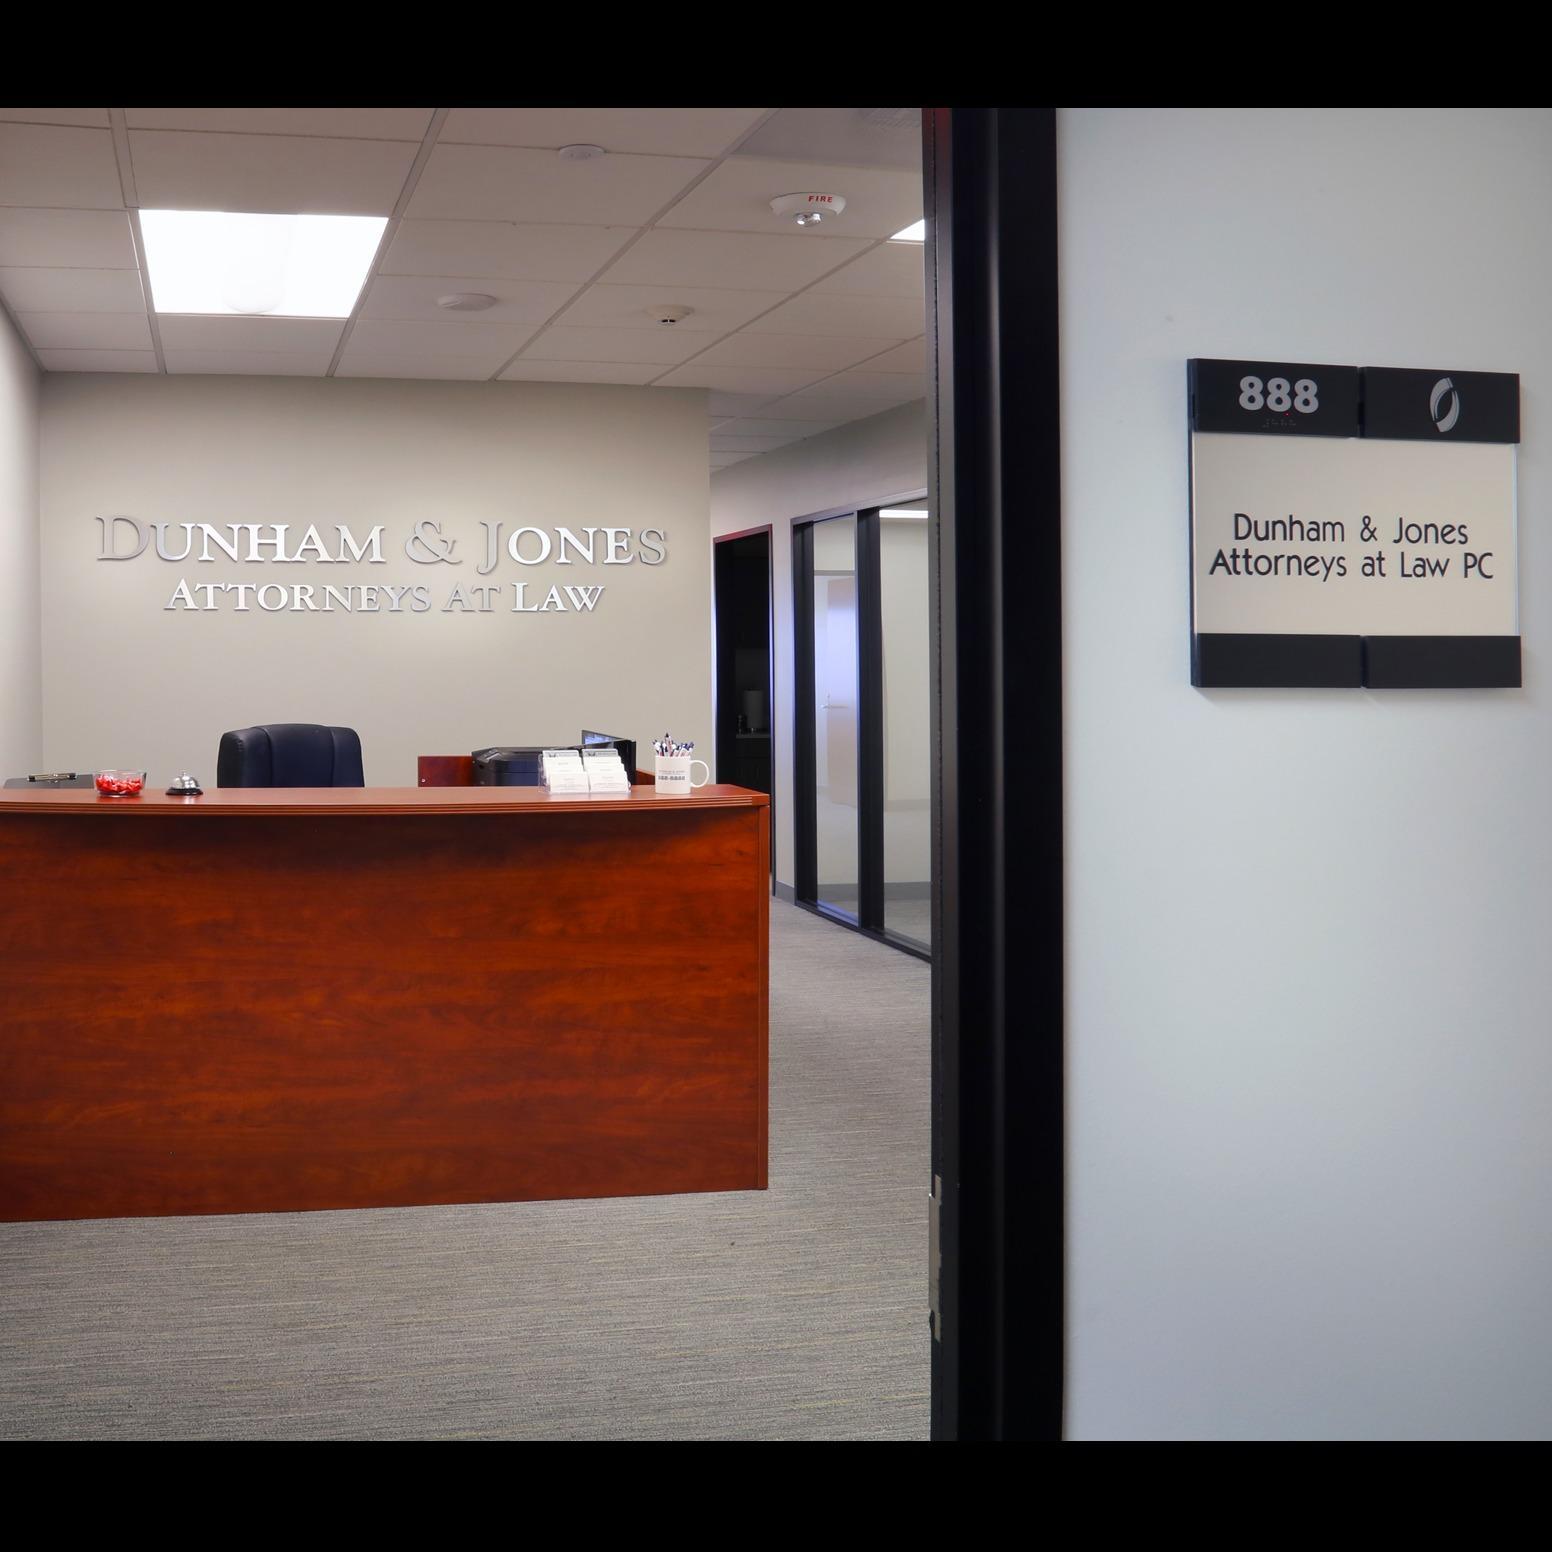 Dunham & Jones, Dallas DWI Attorneys